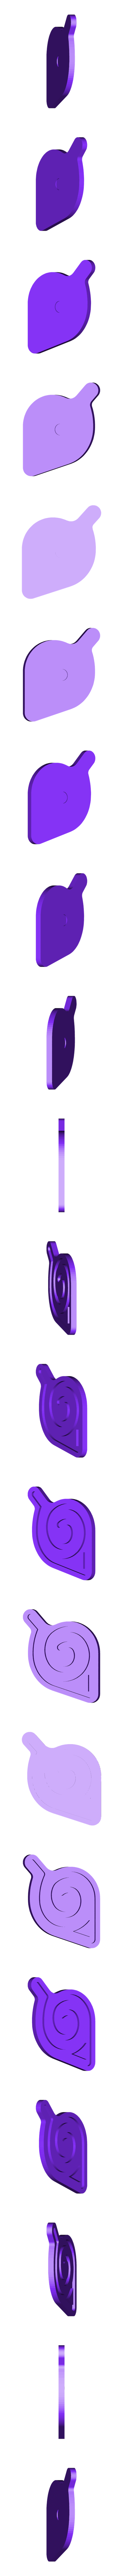 Blanc_Naru.stl Download STL file Hand Spinner Naruto • 3D printer template, Guich